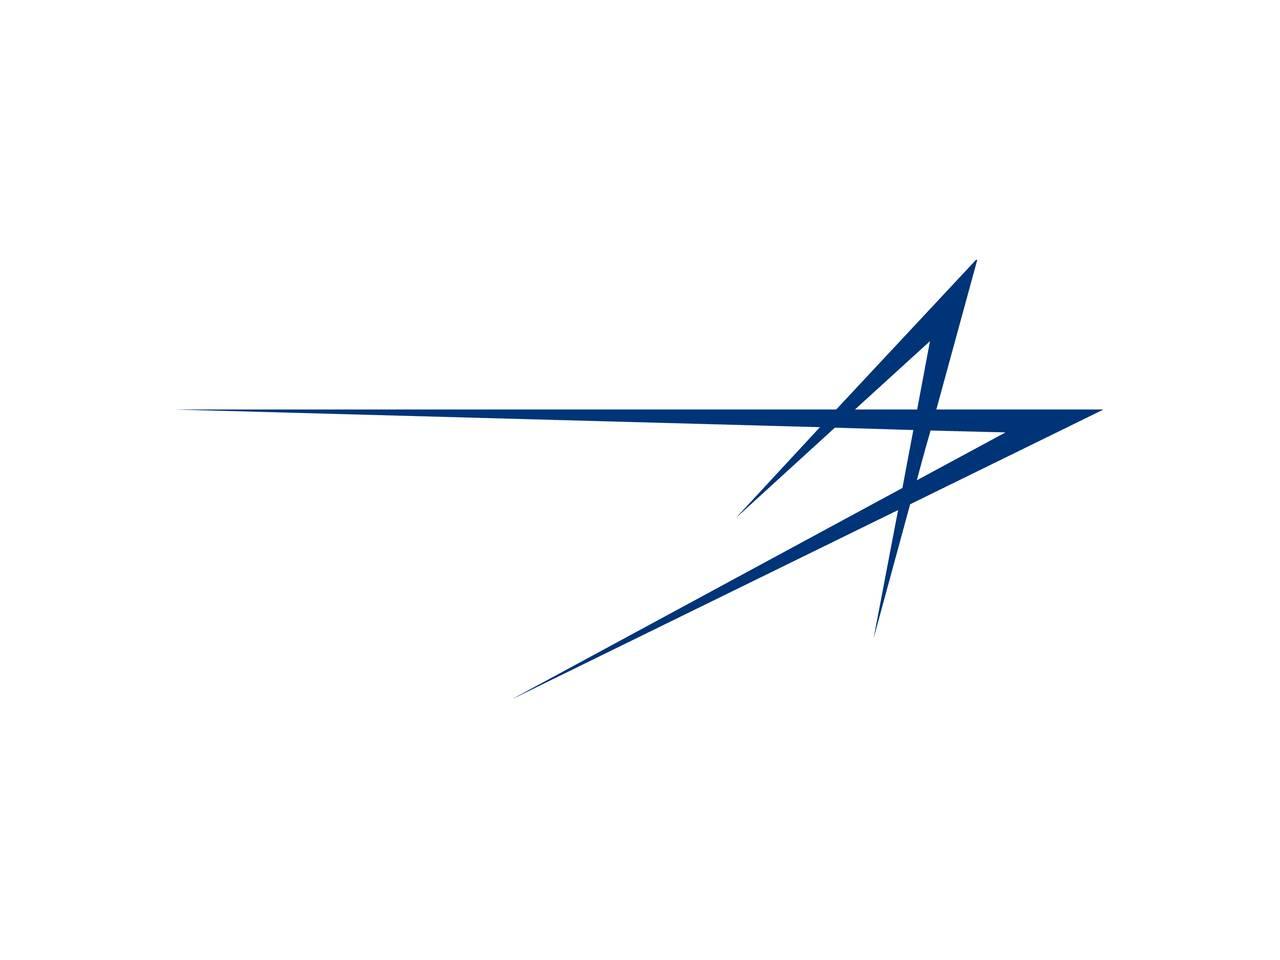 Lockheed Martin 2016 Q3 Results Earnings Call Slides Lockheed